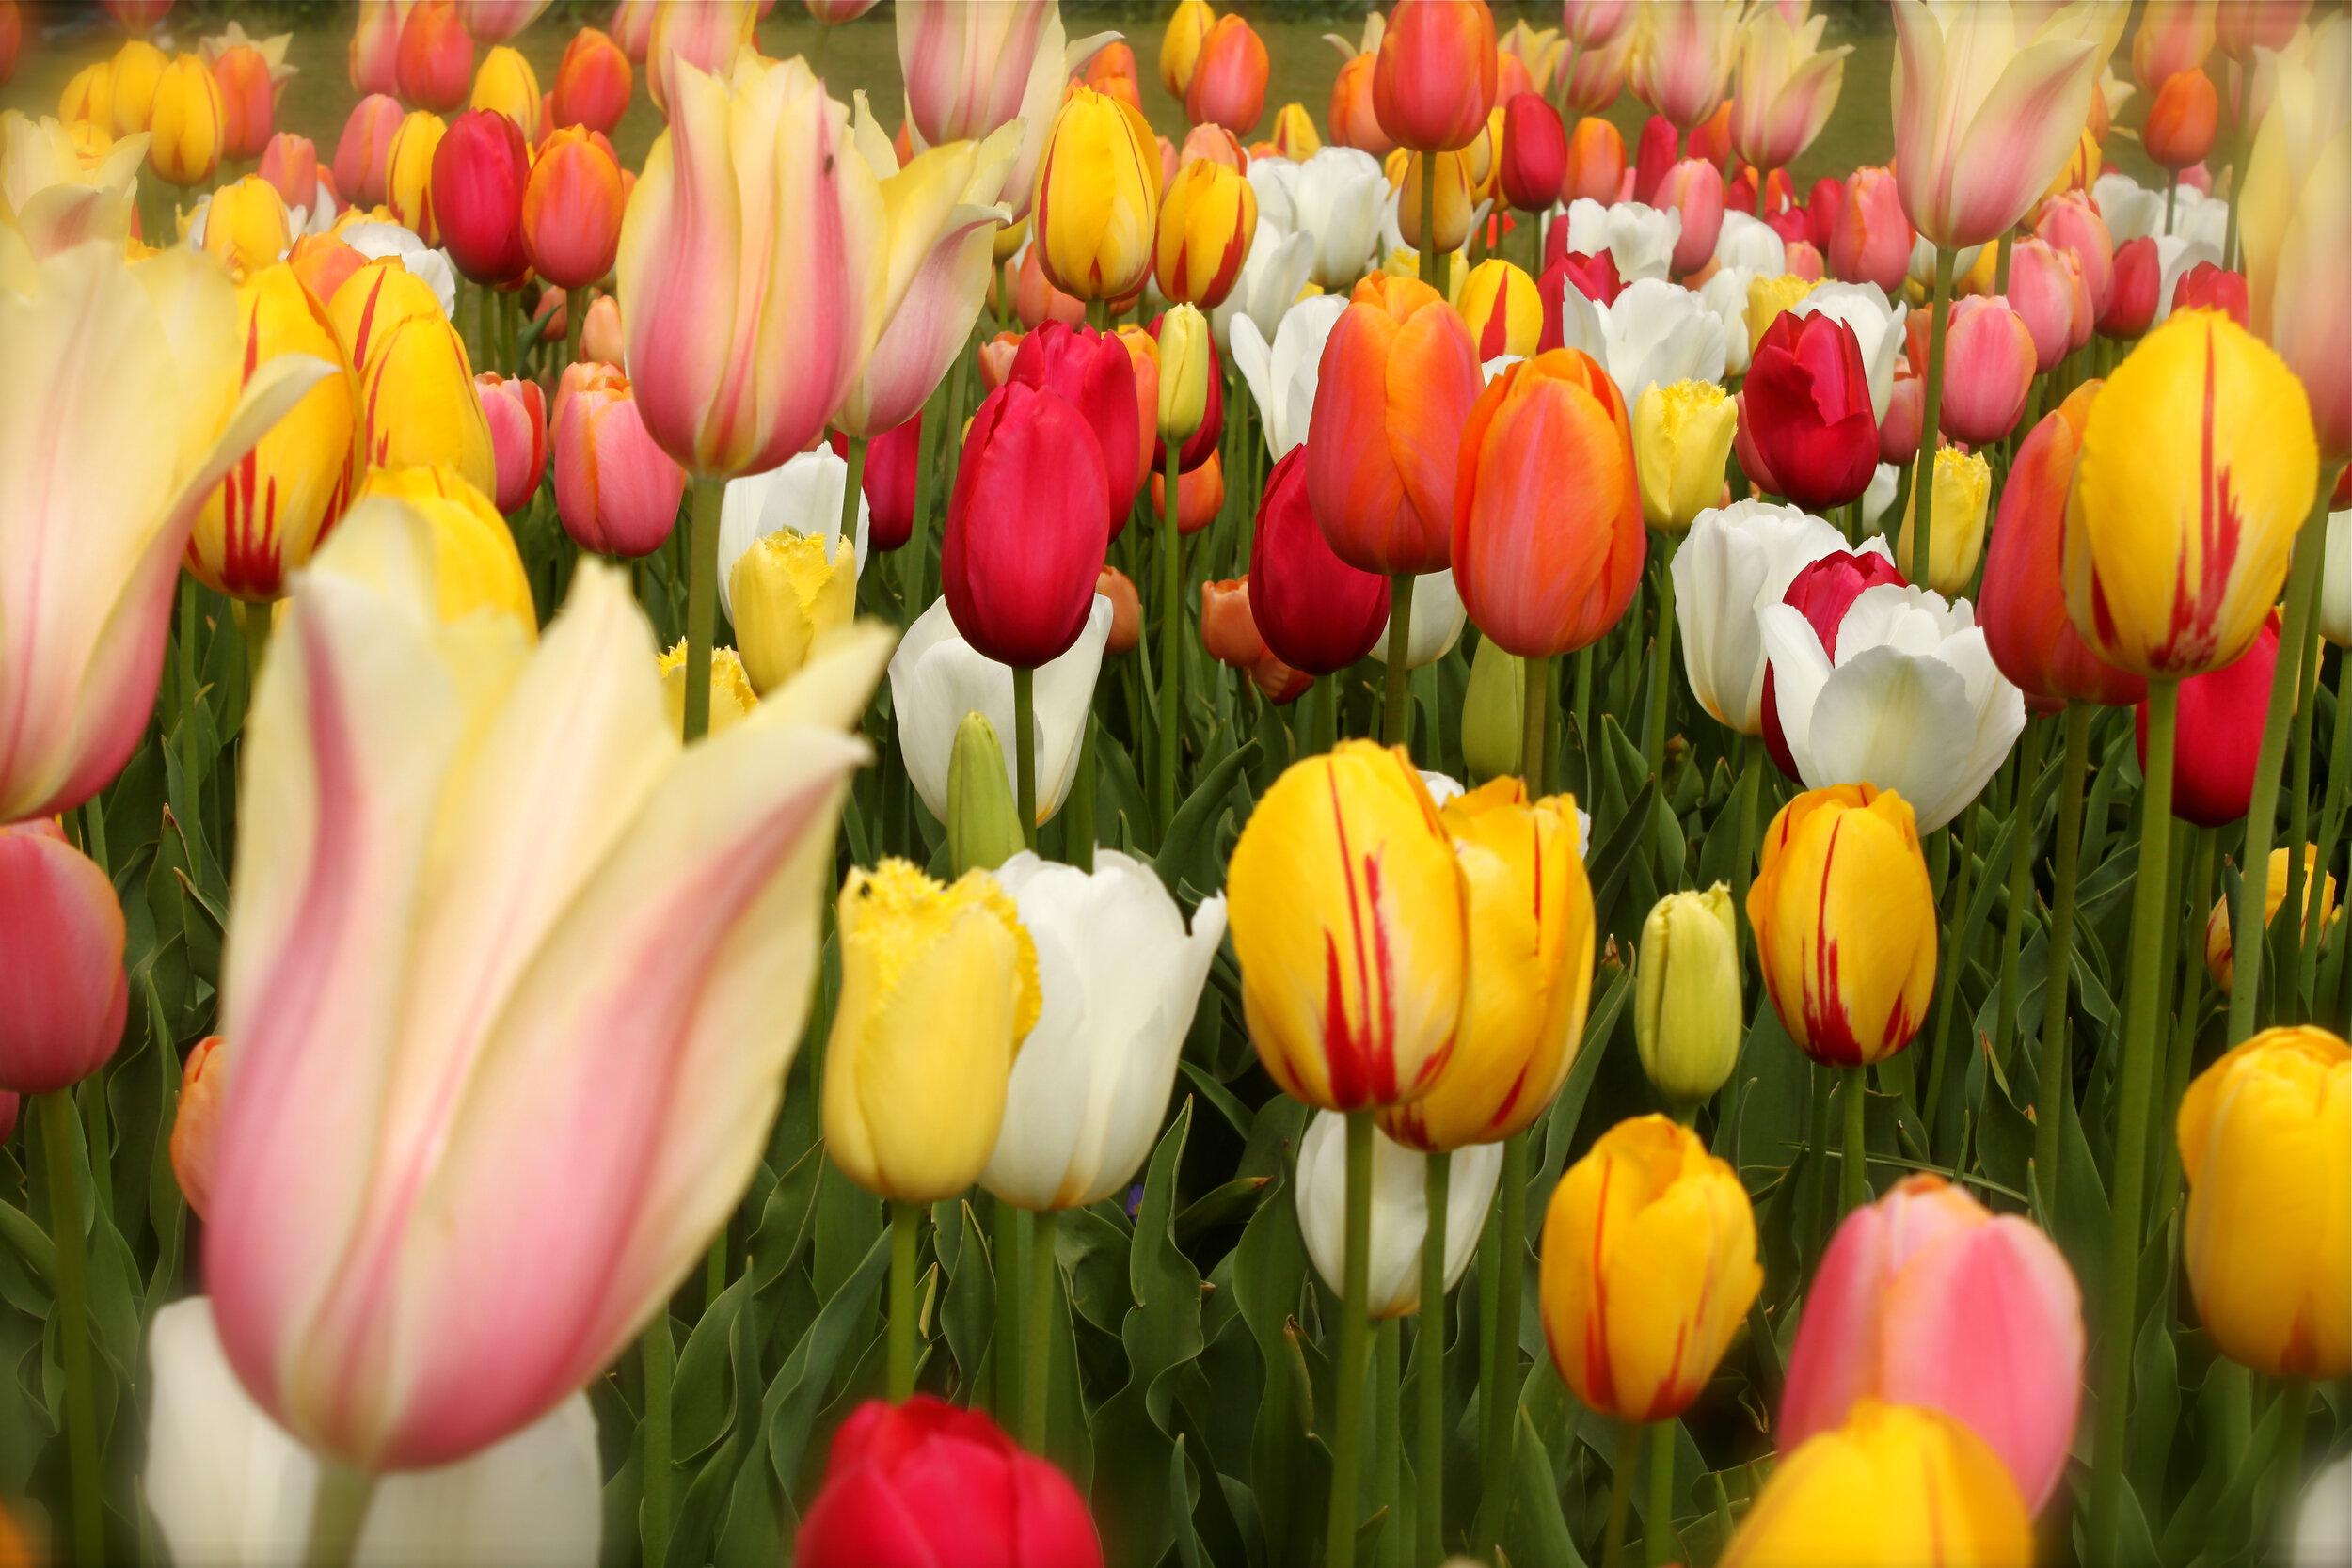 Atorres_Tulips.jpg